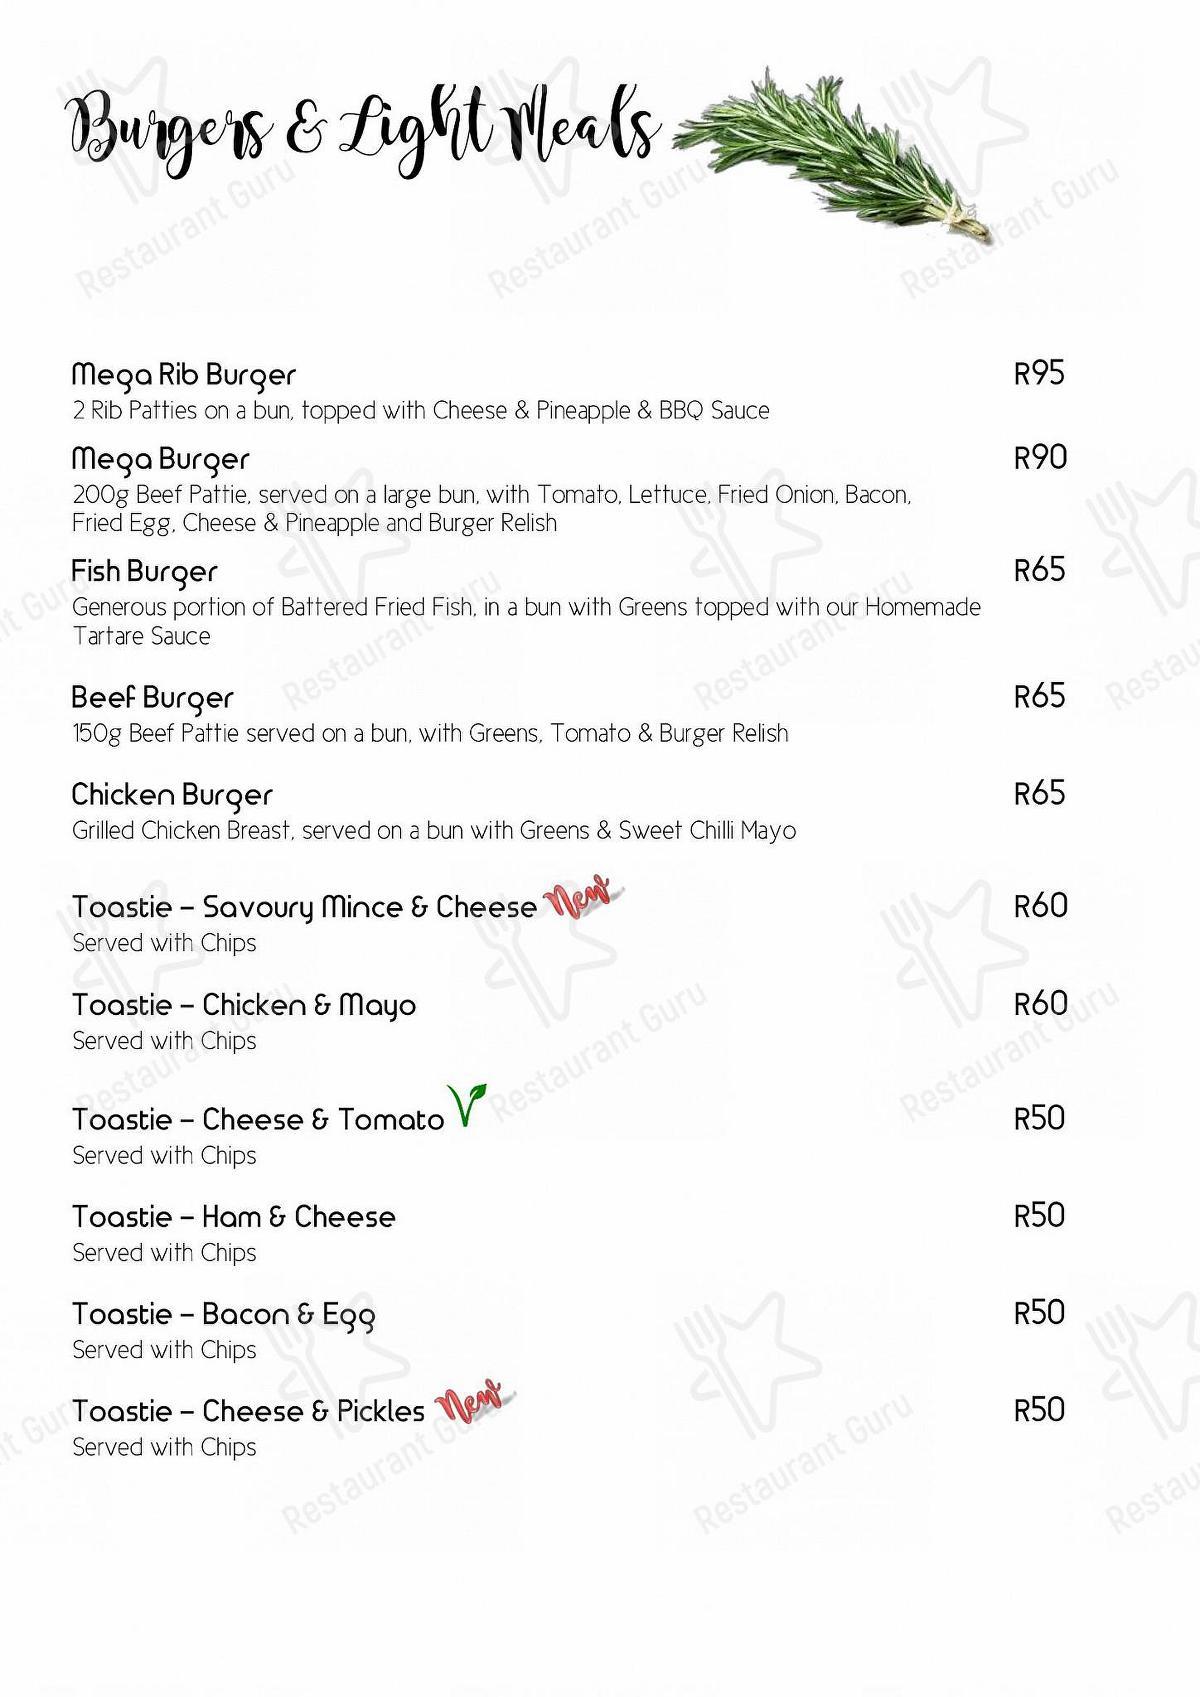 Check out the menu for Steve's Pub & Restaurant